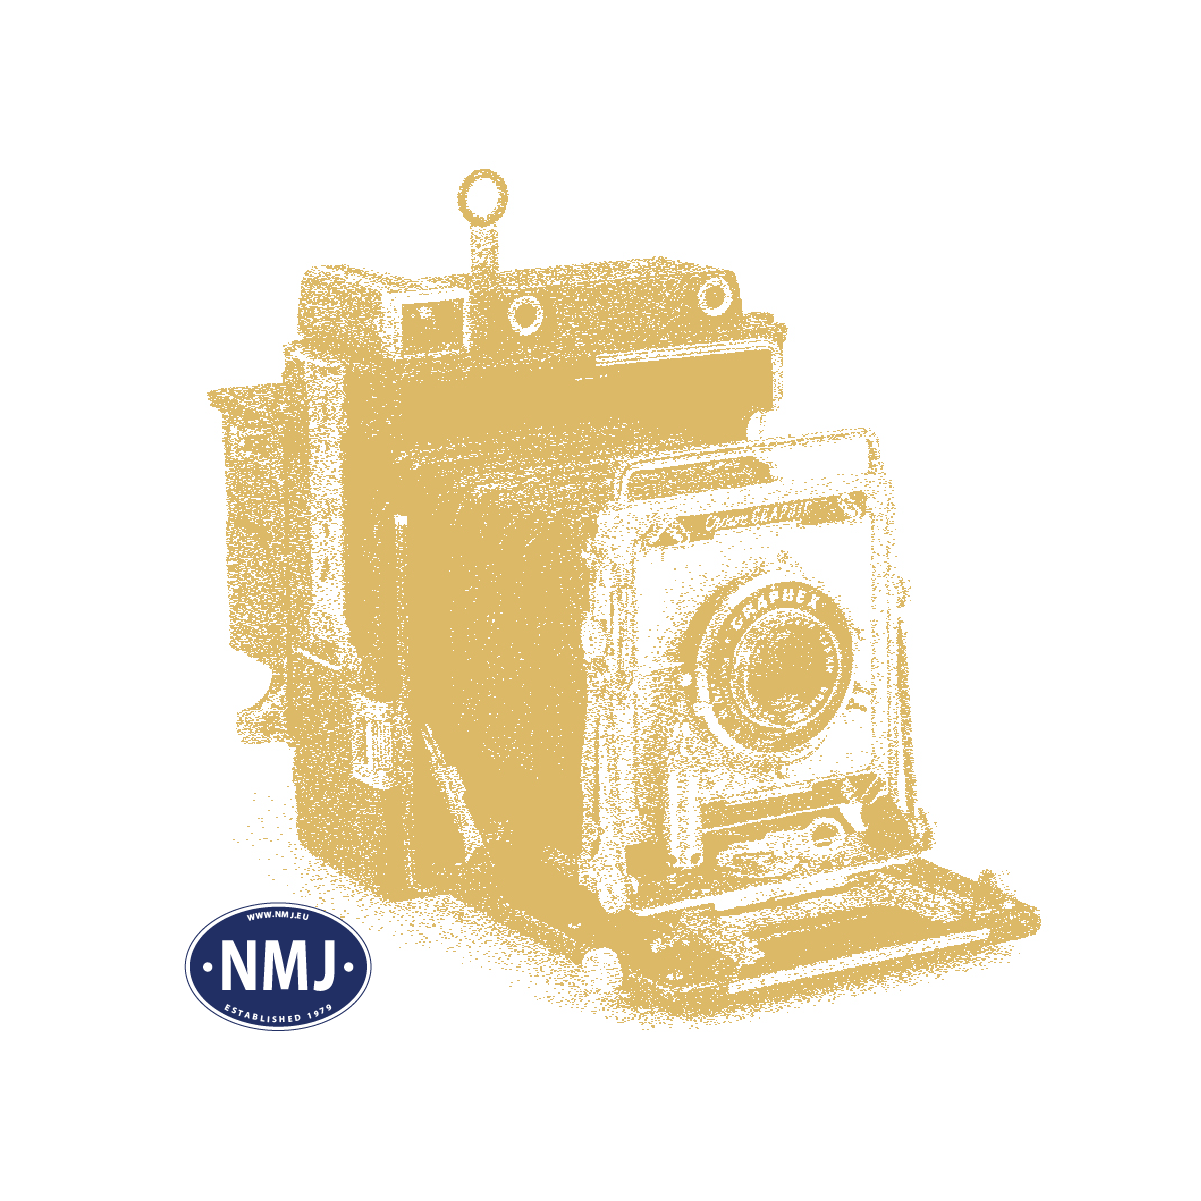 "NMJT90003 - NMJ Topline NSB Di3a.615 ""Nohab"", Nydesign, DC"